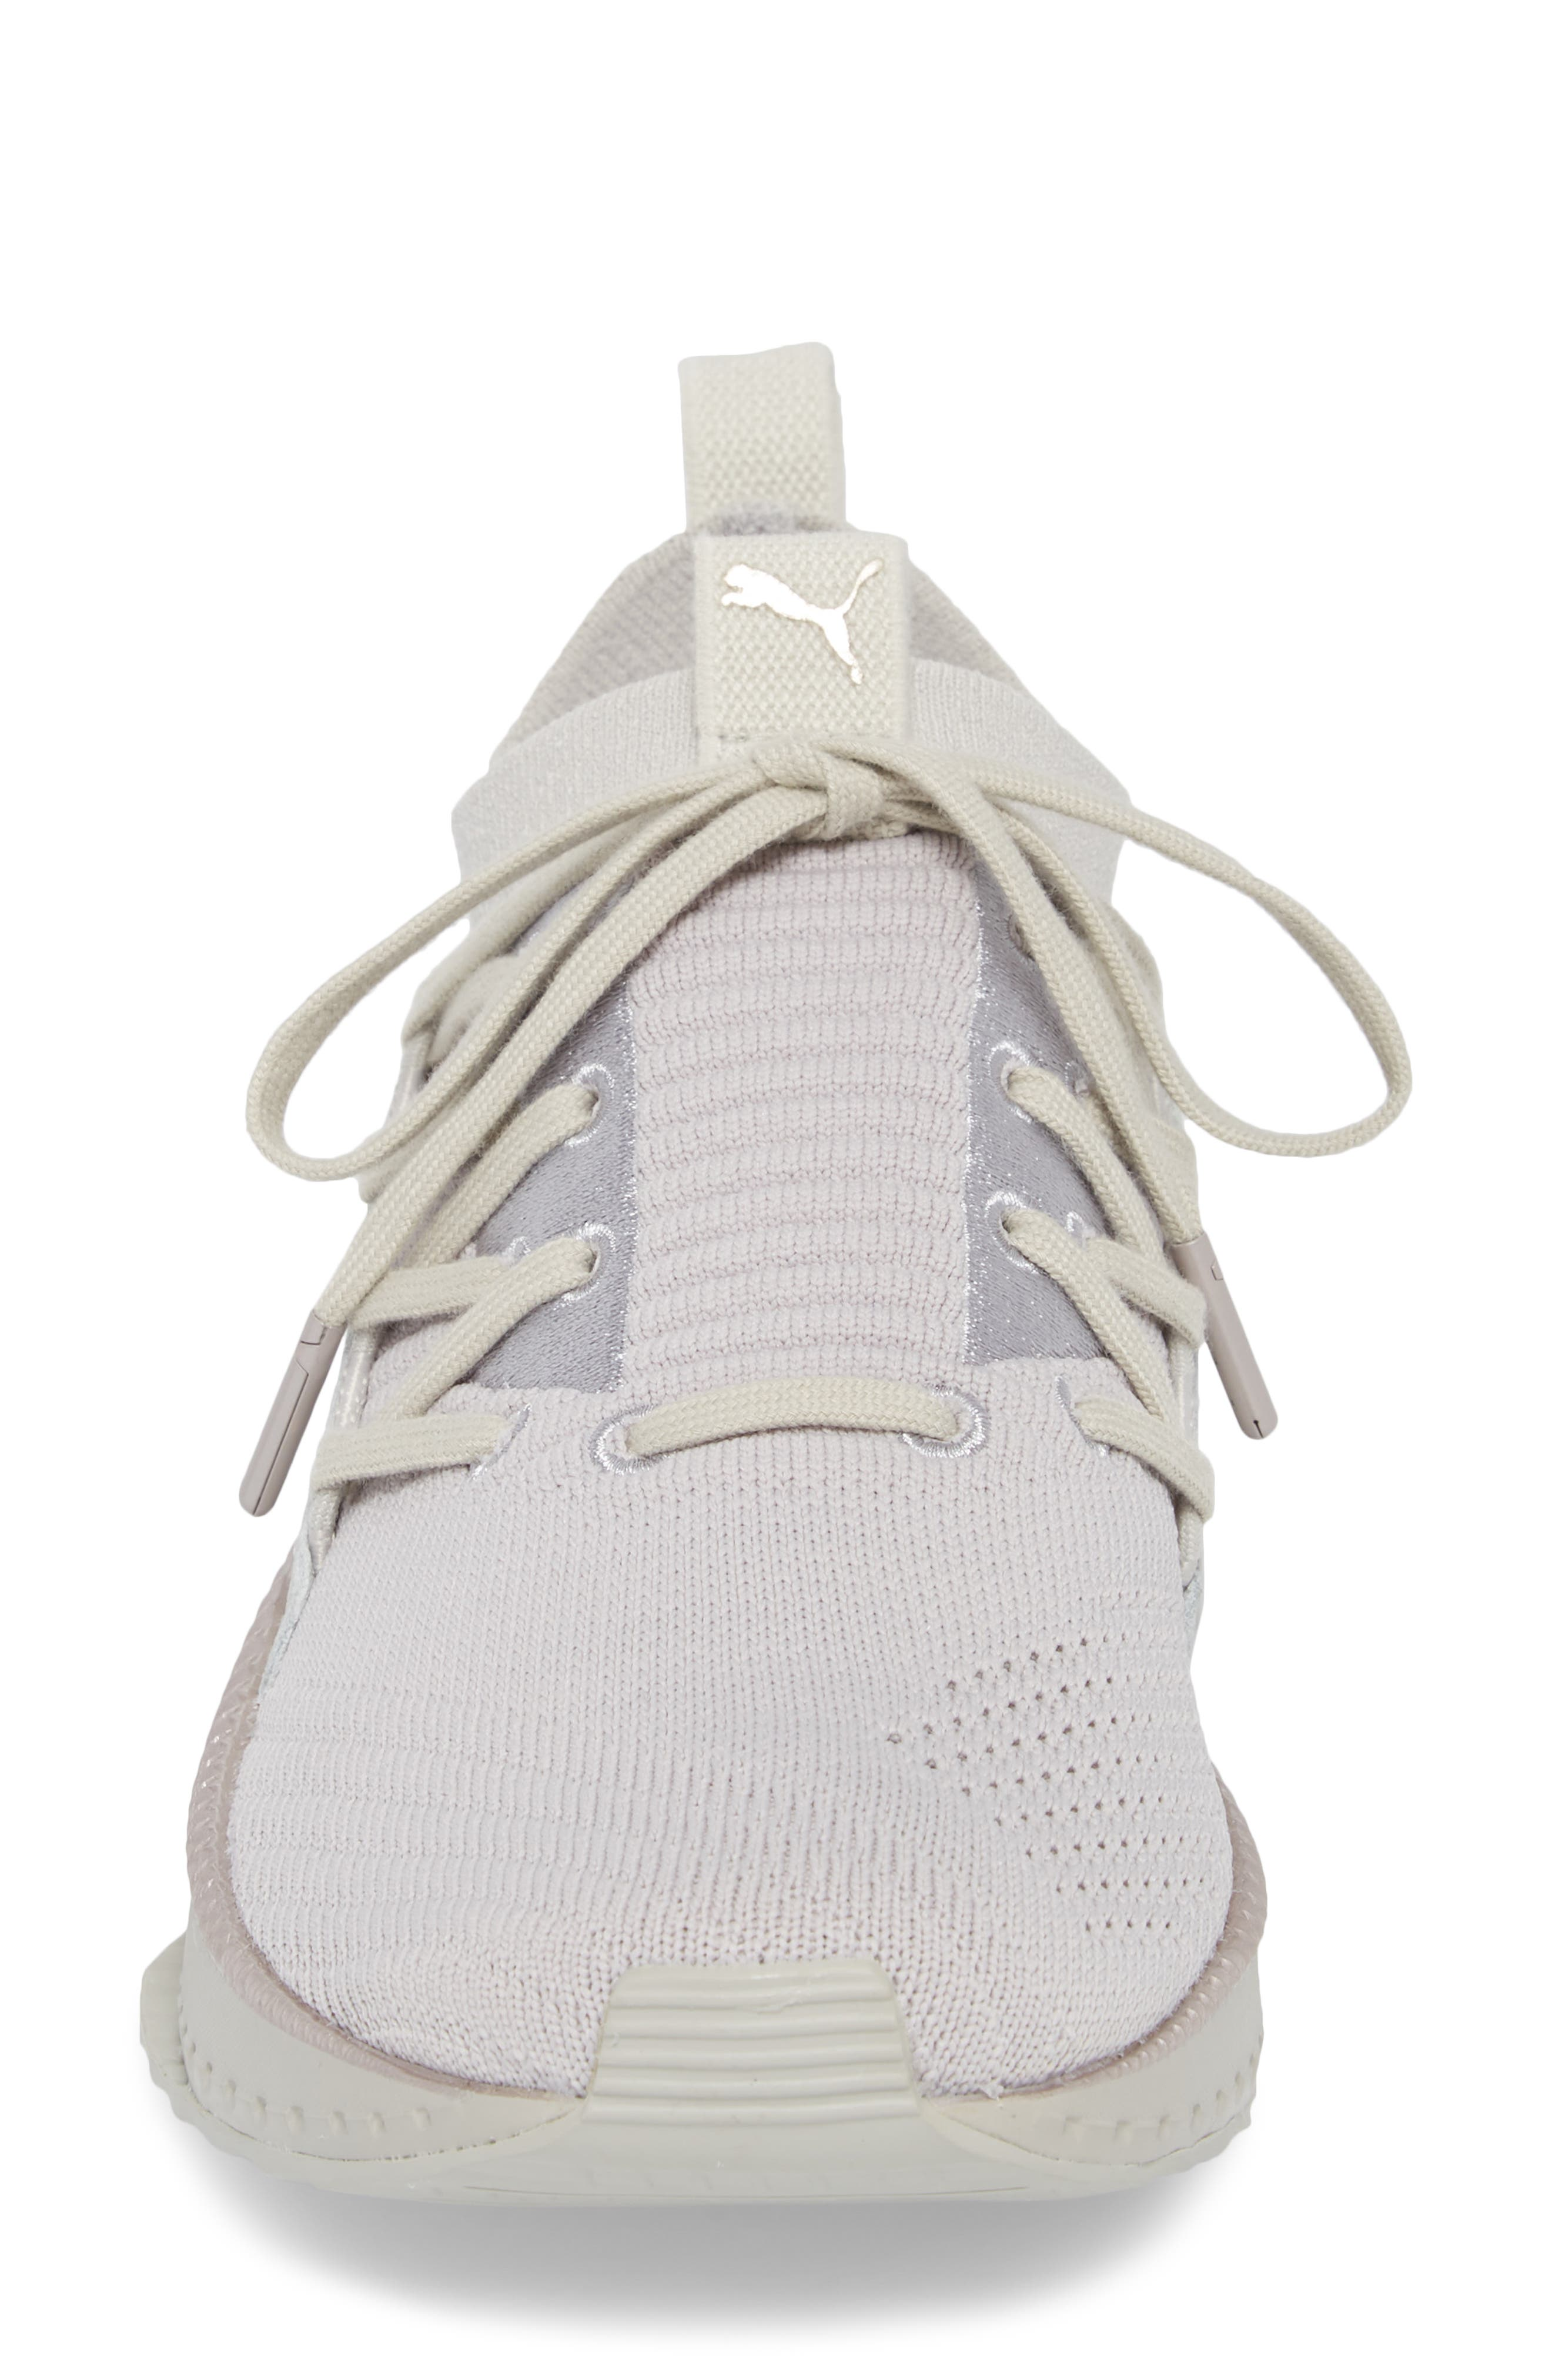 Tsugi Jun Training Shoe,                             Alternate thumbnail 4, color,                             Gray Violet/ Metallic Beige